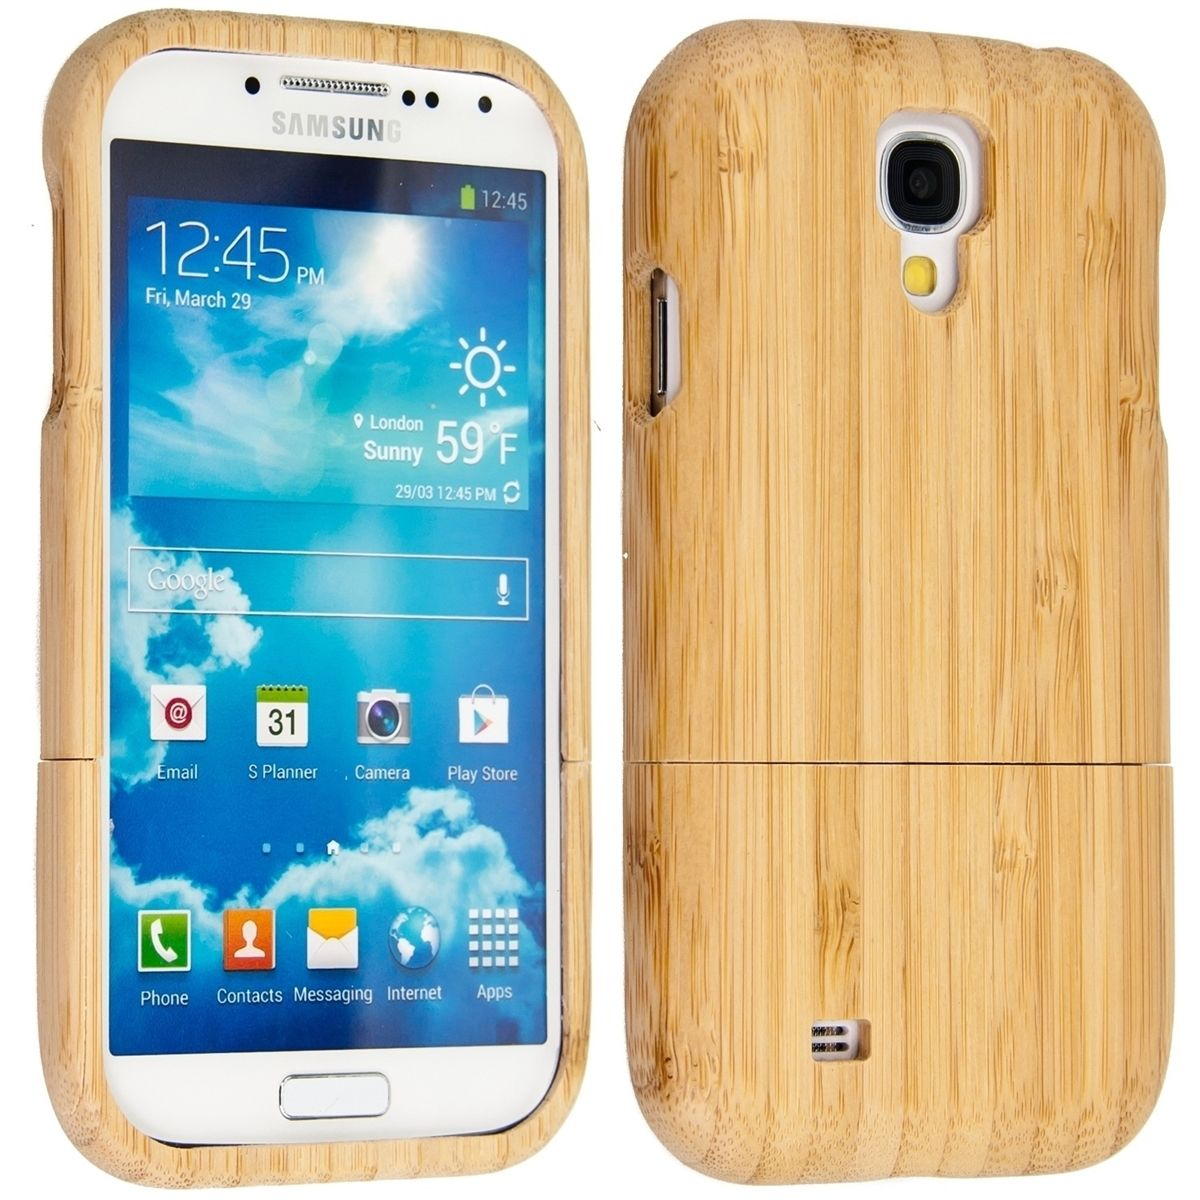 Pouzdro pro Samsung Galaxy S4 i9505 / i9506 LTE+ bambus